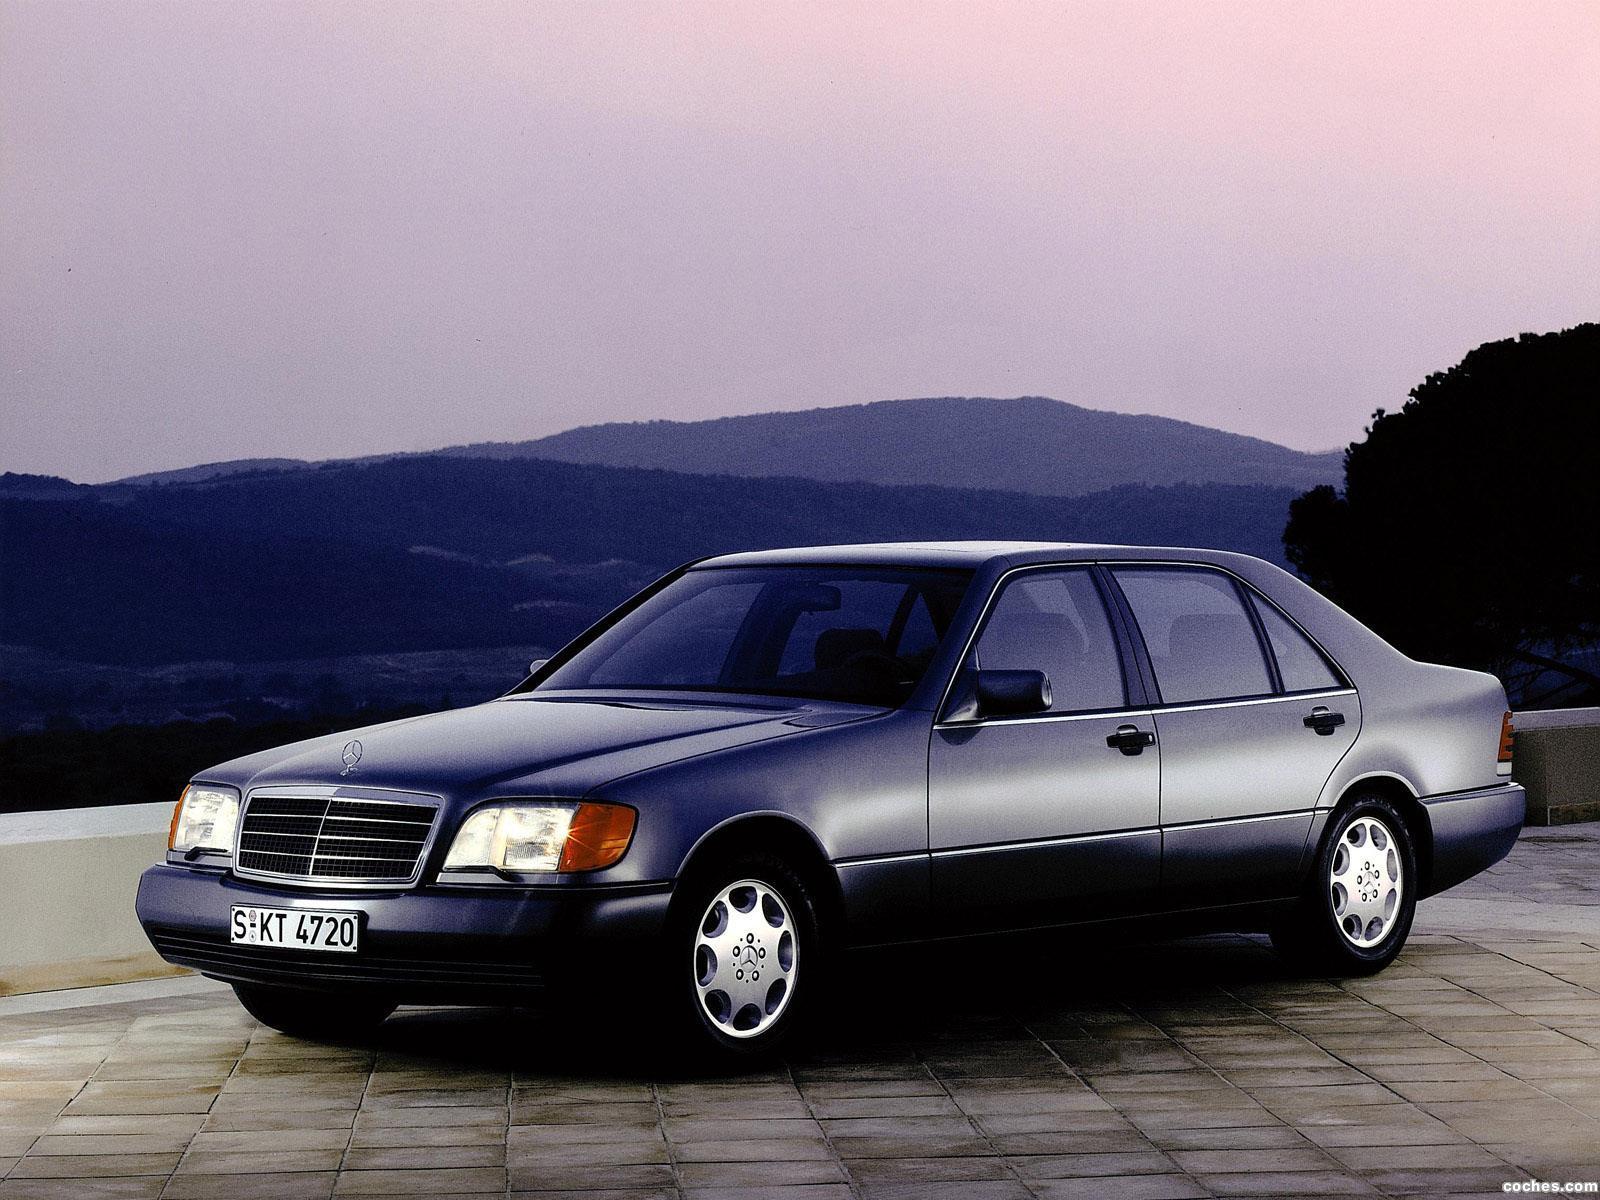 Foto 0 de Mercedes S-Klasse 500SEL W140 1991